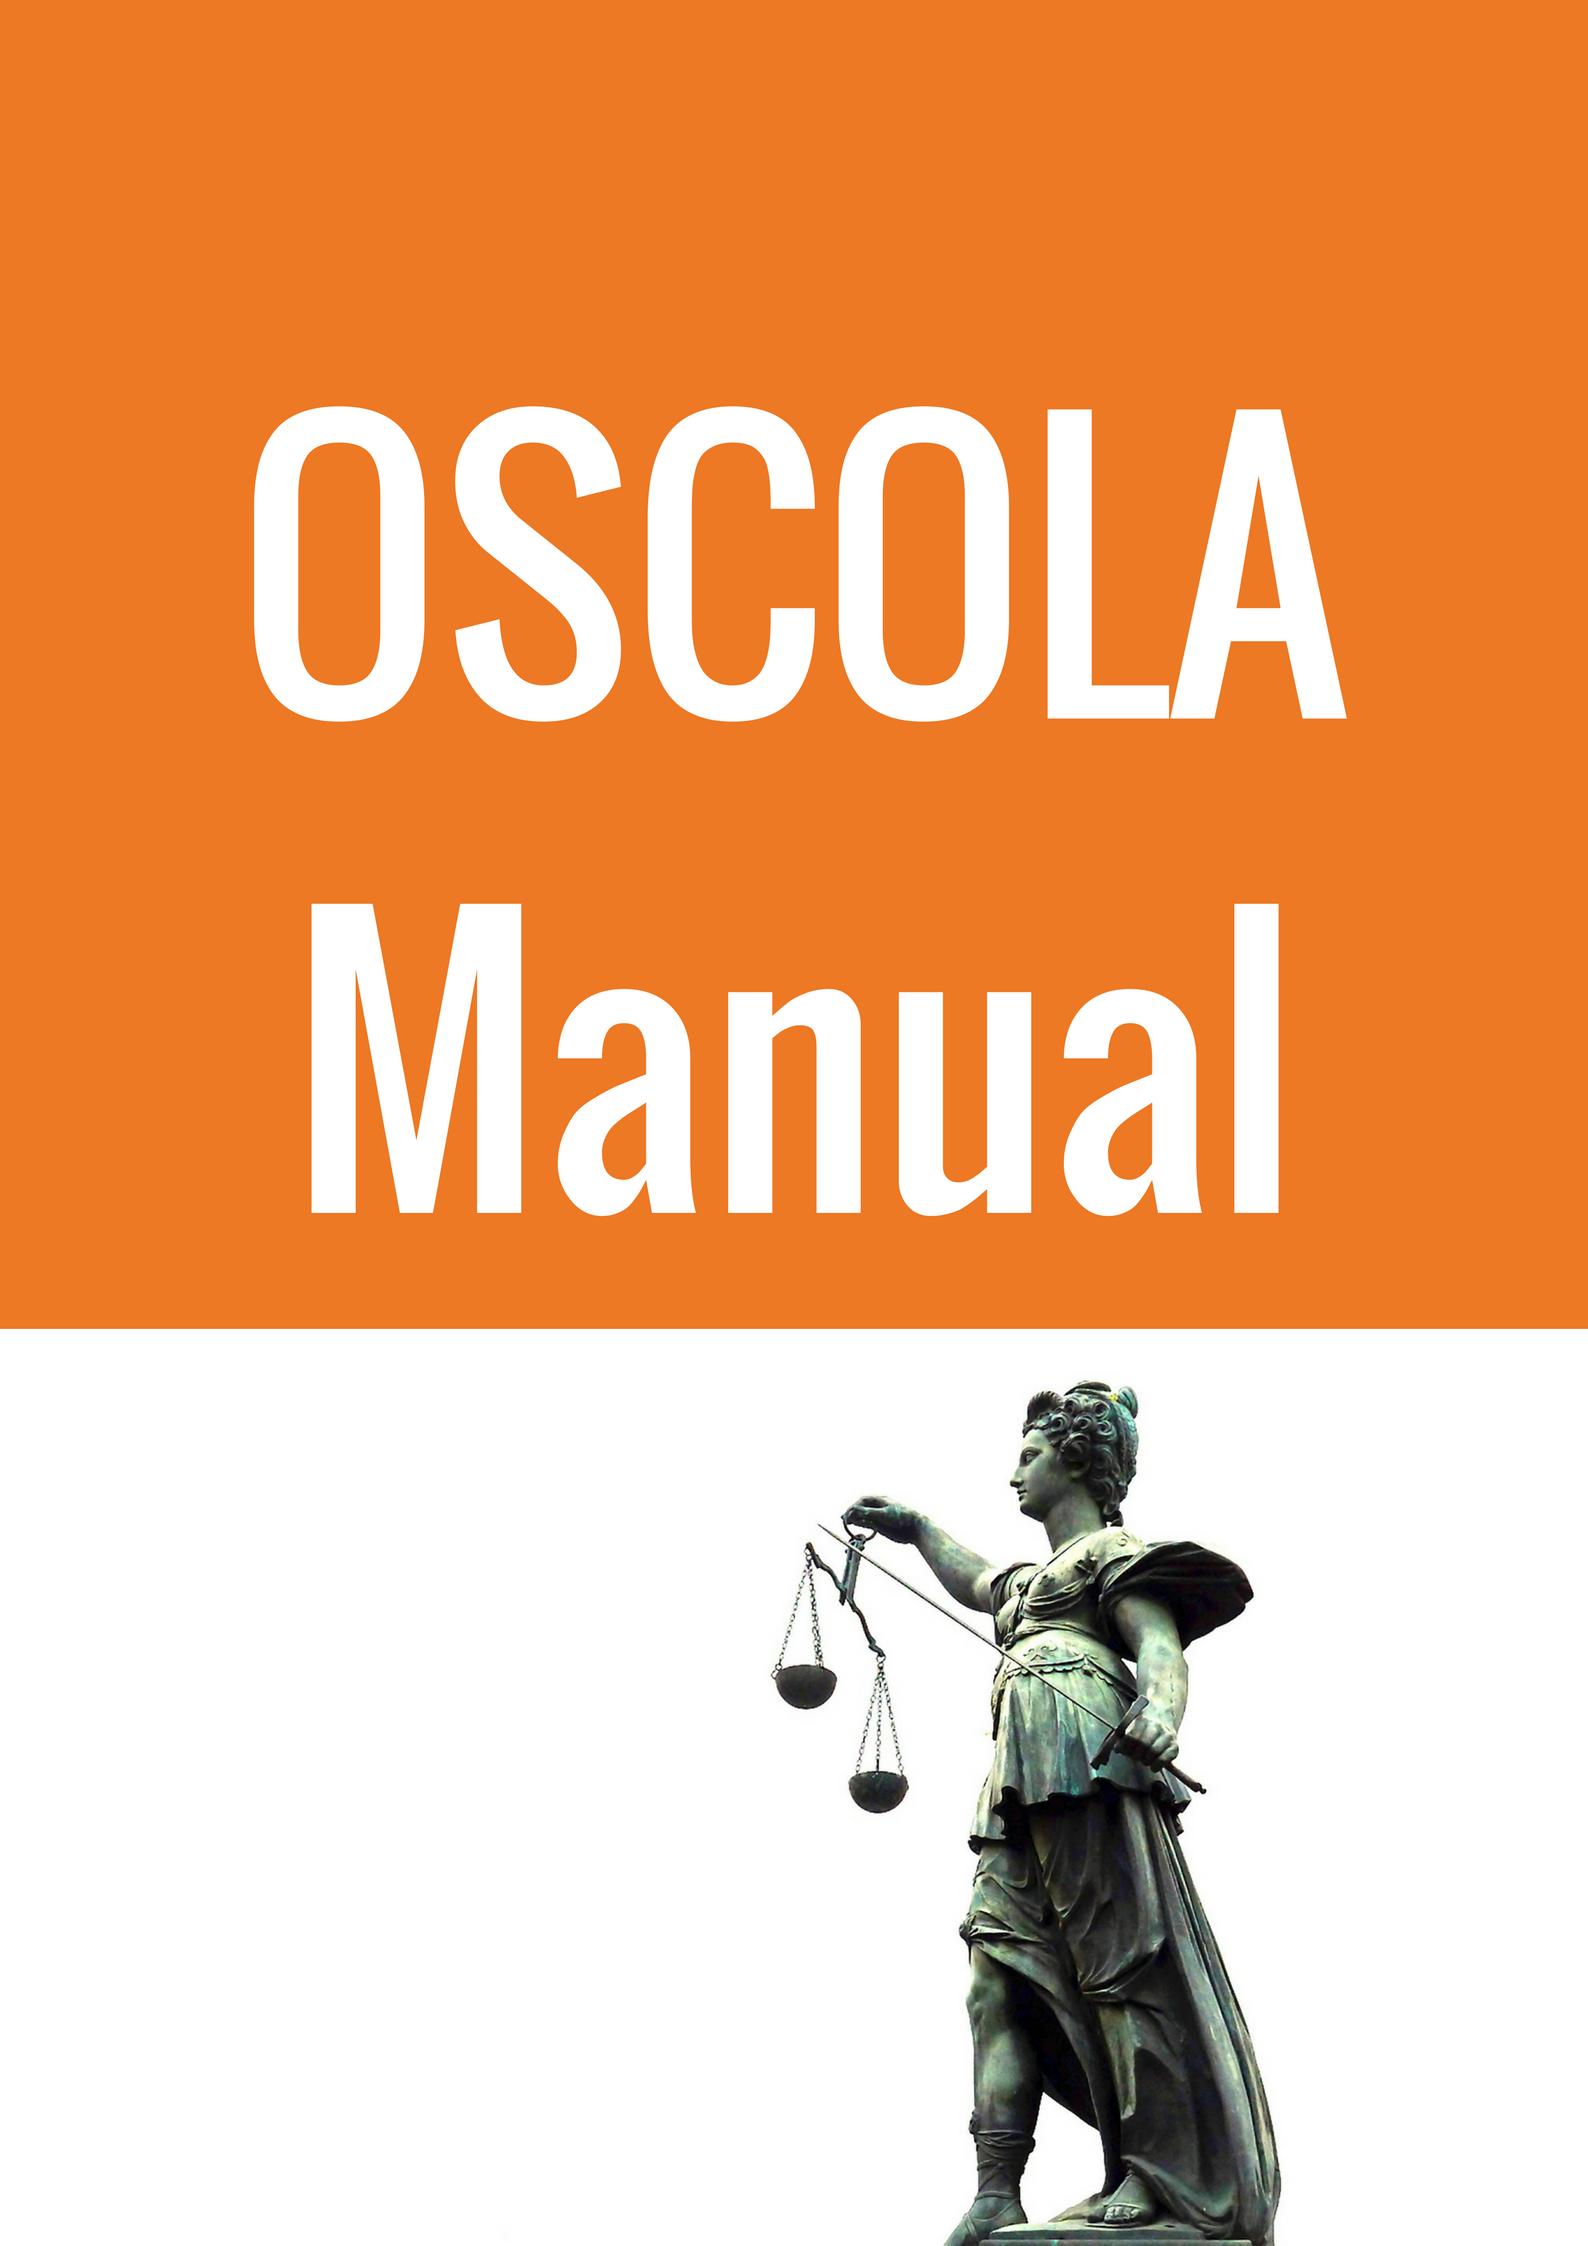 https://libapps-eu.s3.amazonaws.com/customers/4442/images/oscola_manual.png